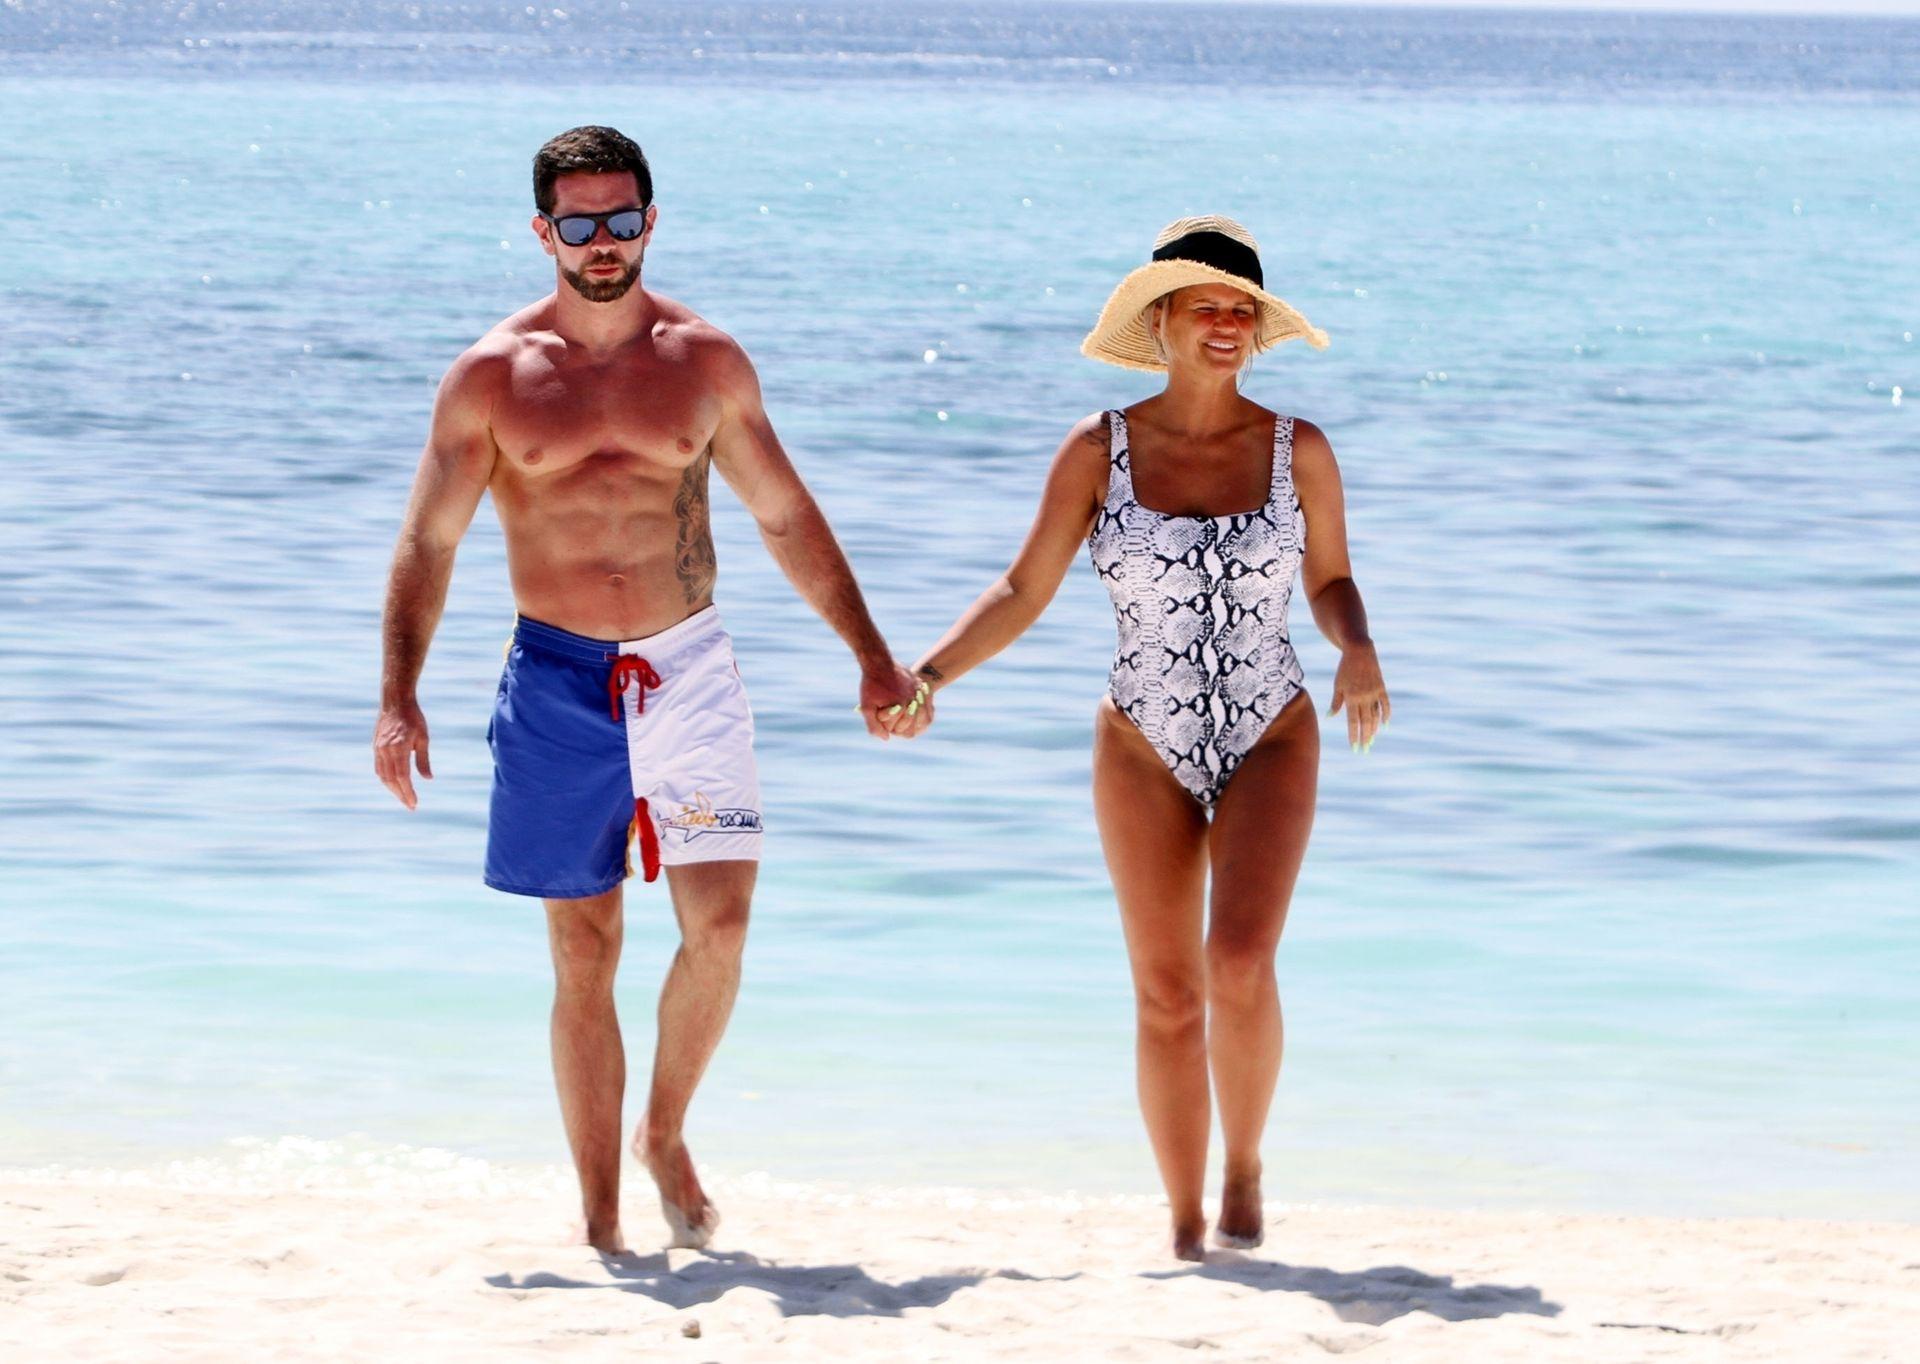 Kerry Katona & Ryan Mahoney Hit The Beach On Holiday At Their Luxury 5 Star Resort Ayada Maldives 0011